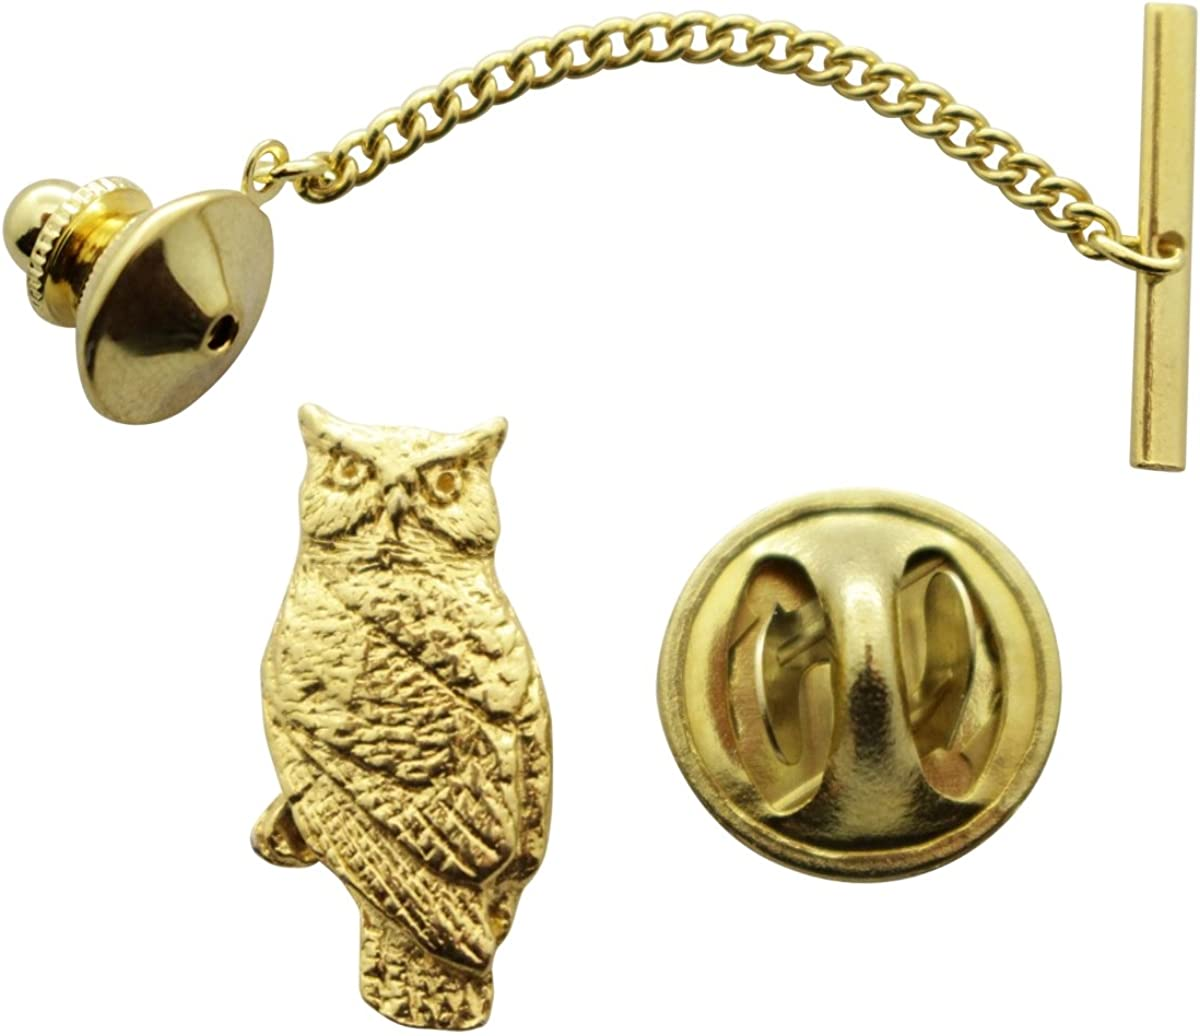 Sarah's Treats & Treasures Owl Tie Tack ~ 24K Gold ~ Tie Tack or Pin